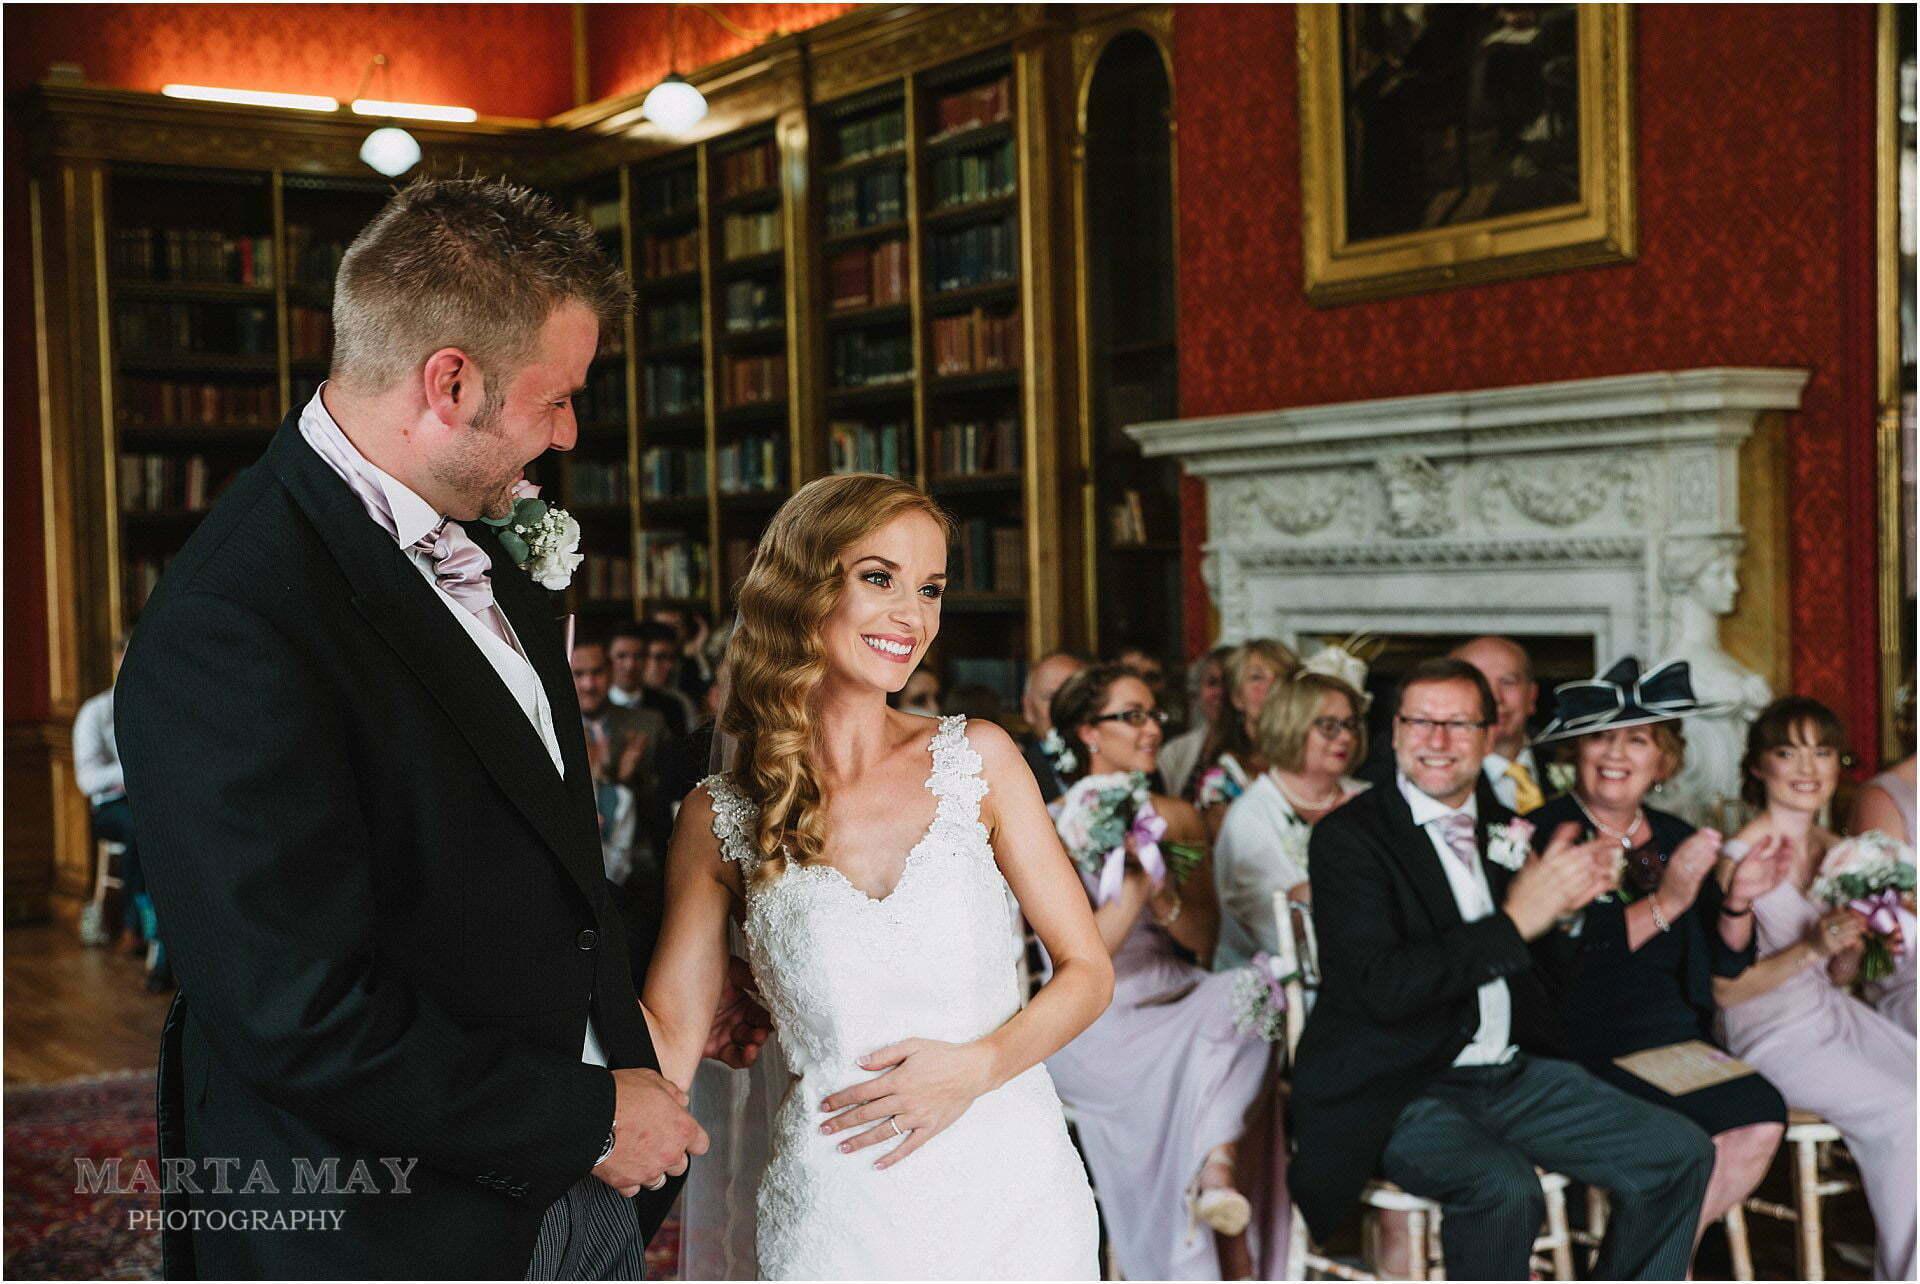 Westonbirt School wedding ceremony photos